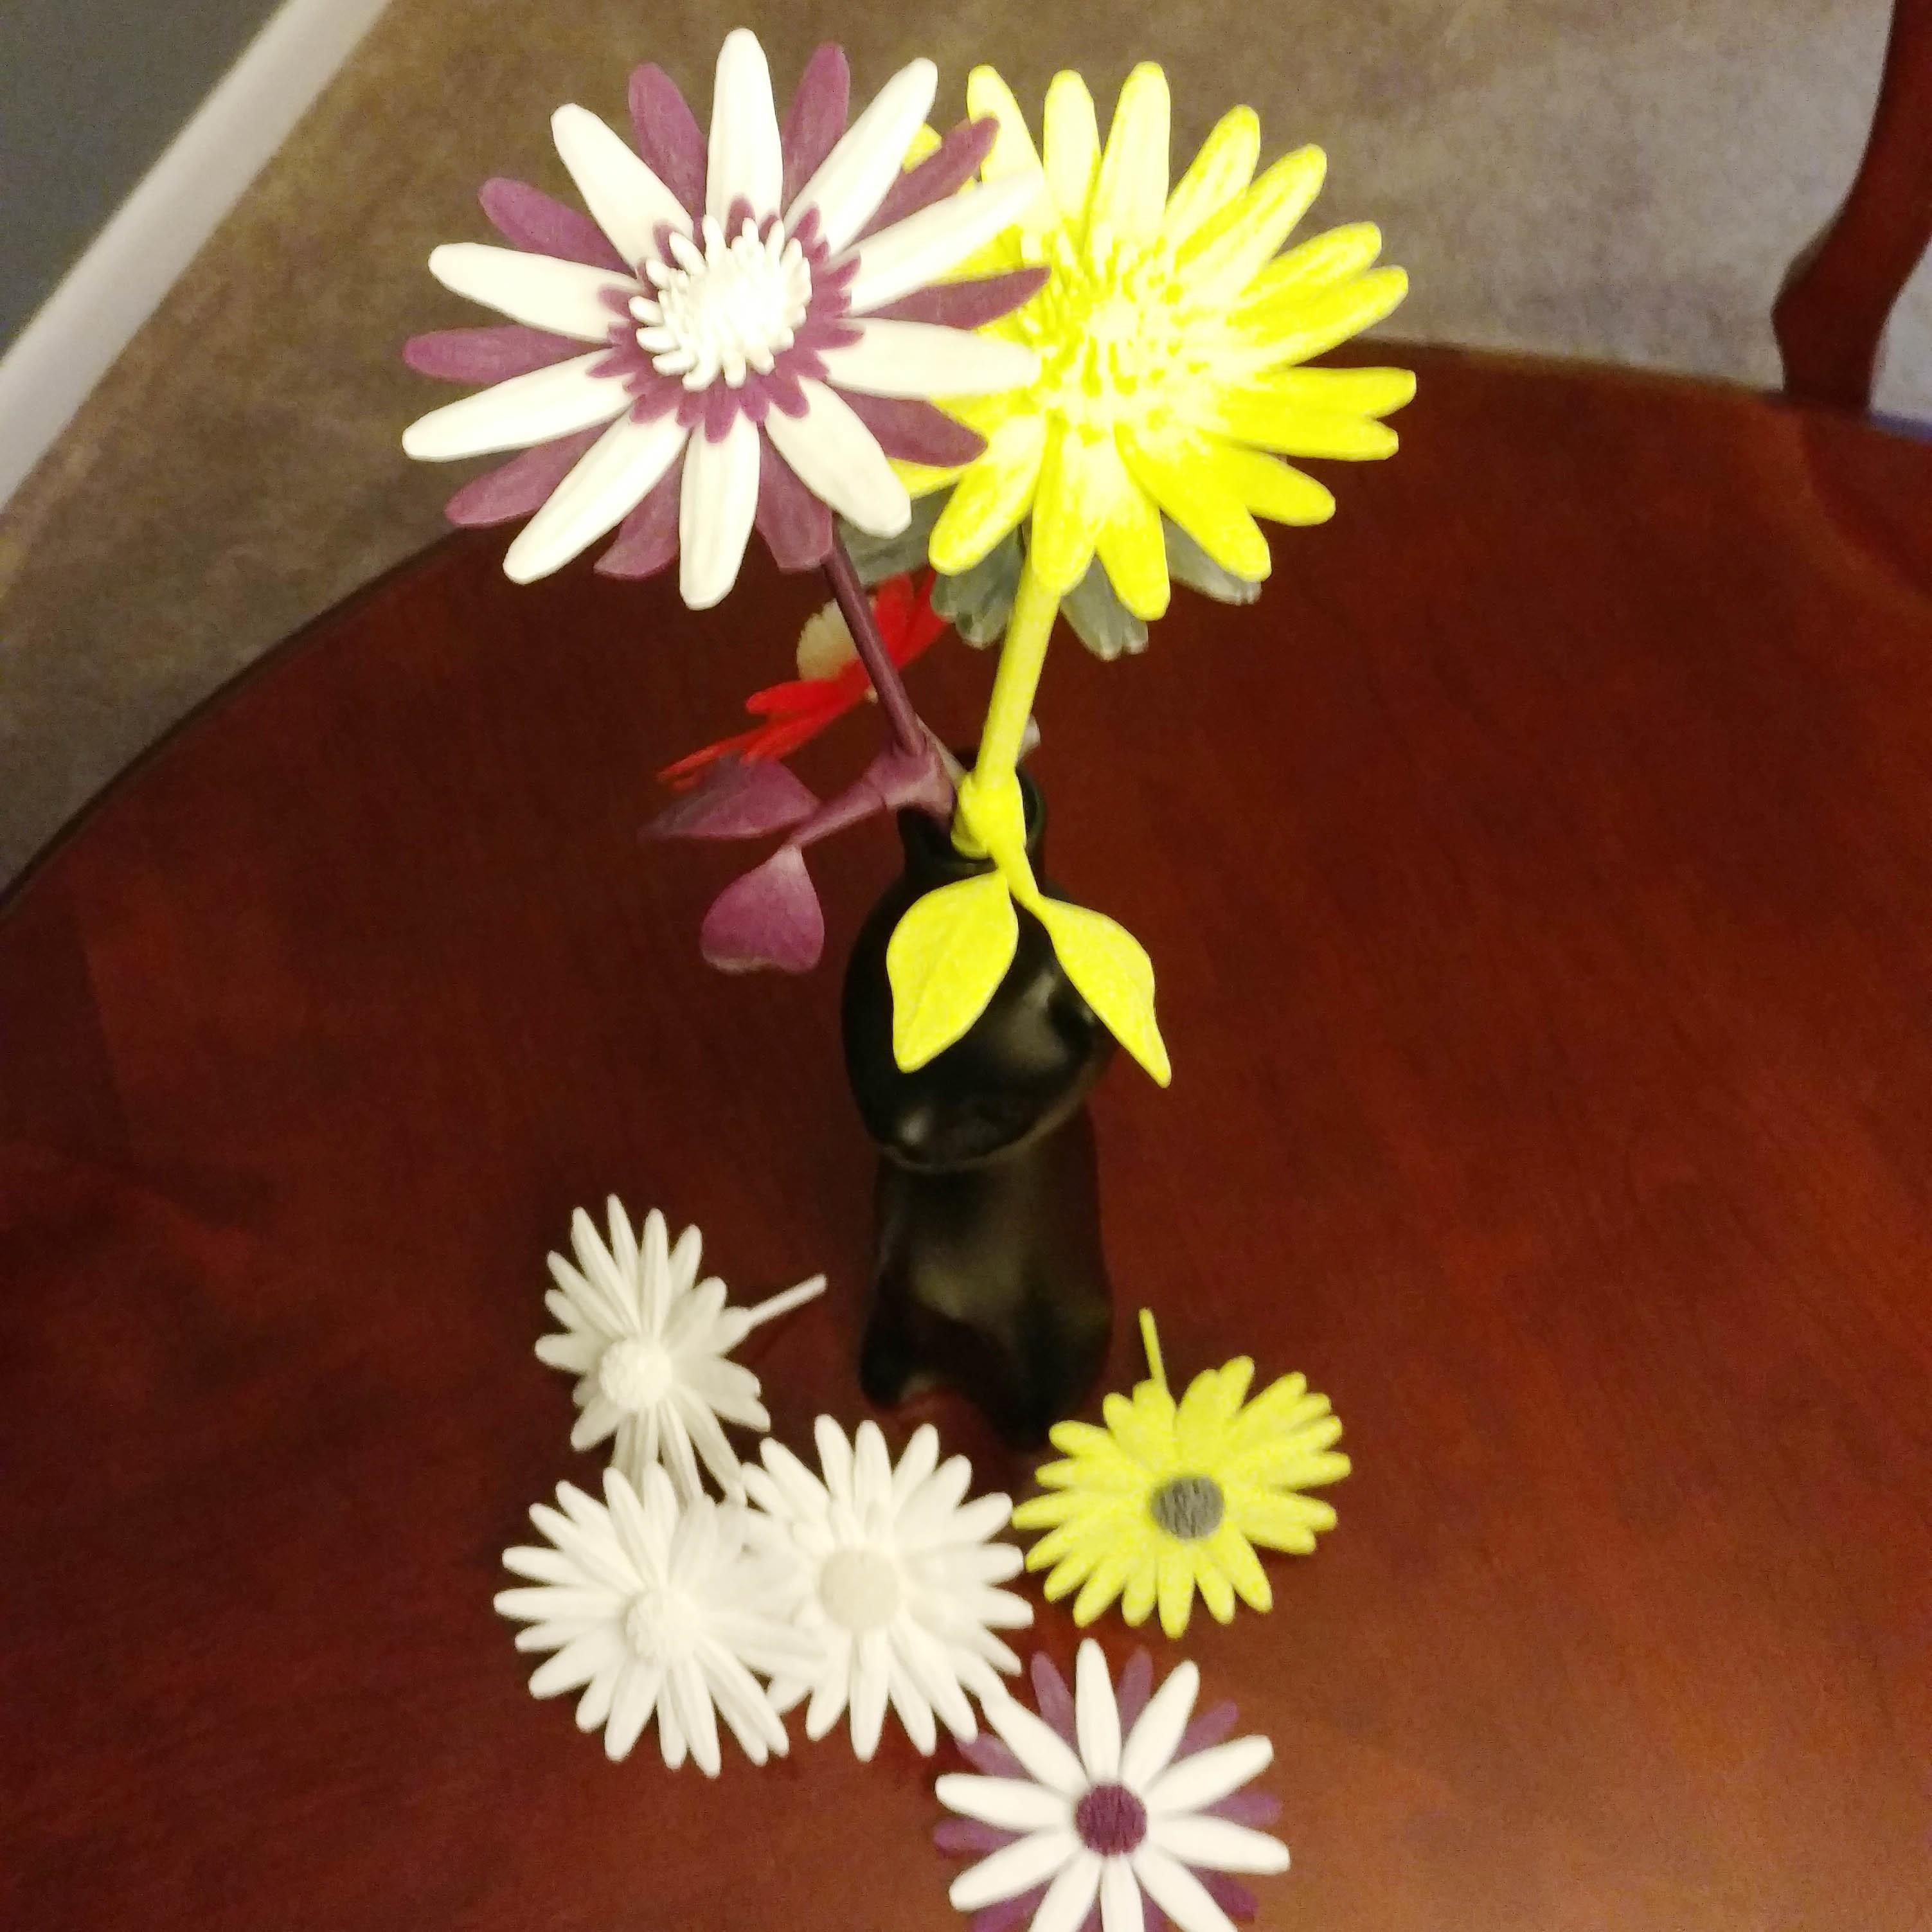 5.jpg Download free STL file Daisy - Flat flower • 3D printable template, mag-net